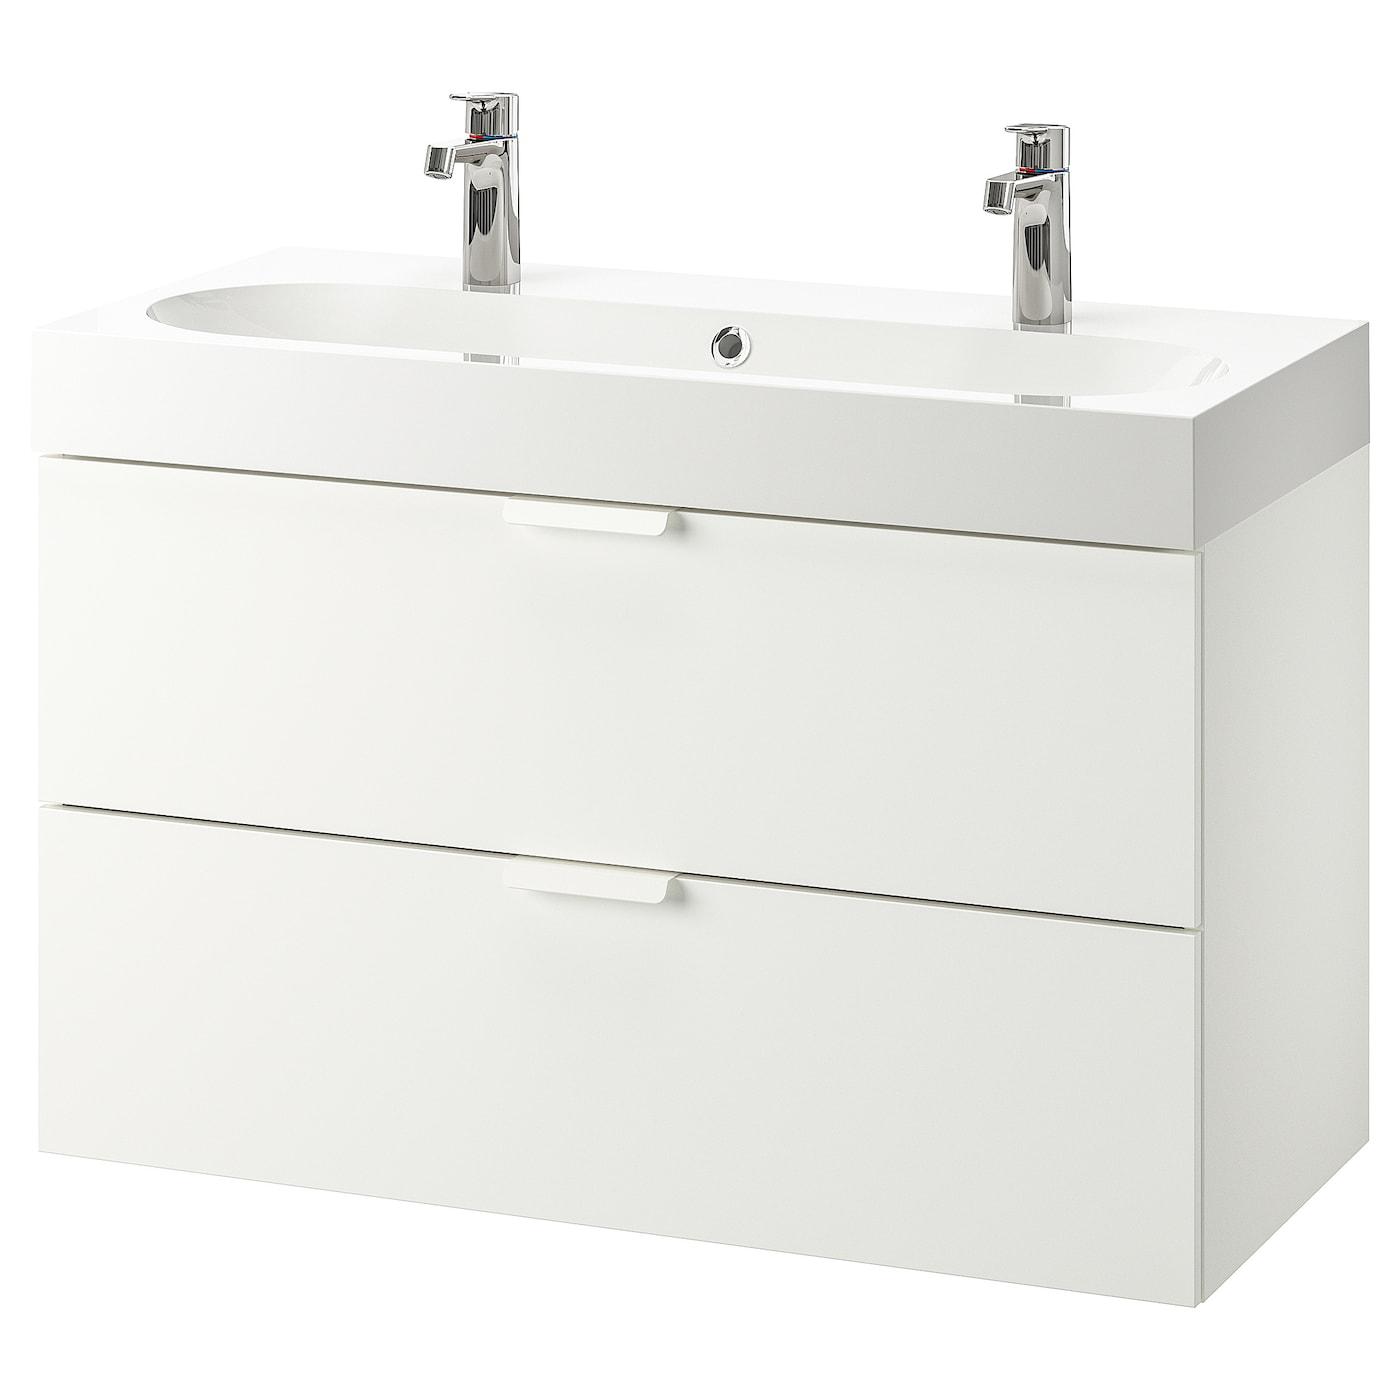 GODMORGON / BRÅVIKEN Wash-stand with 5 drawers - white/Brogrund tap  5x5x5 cm